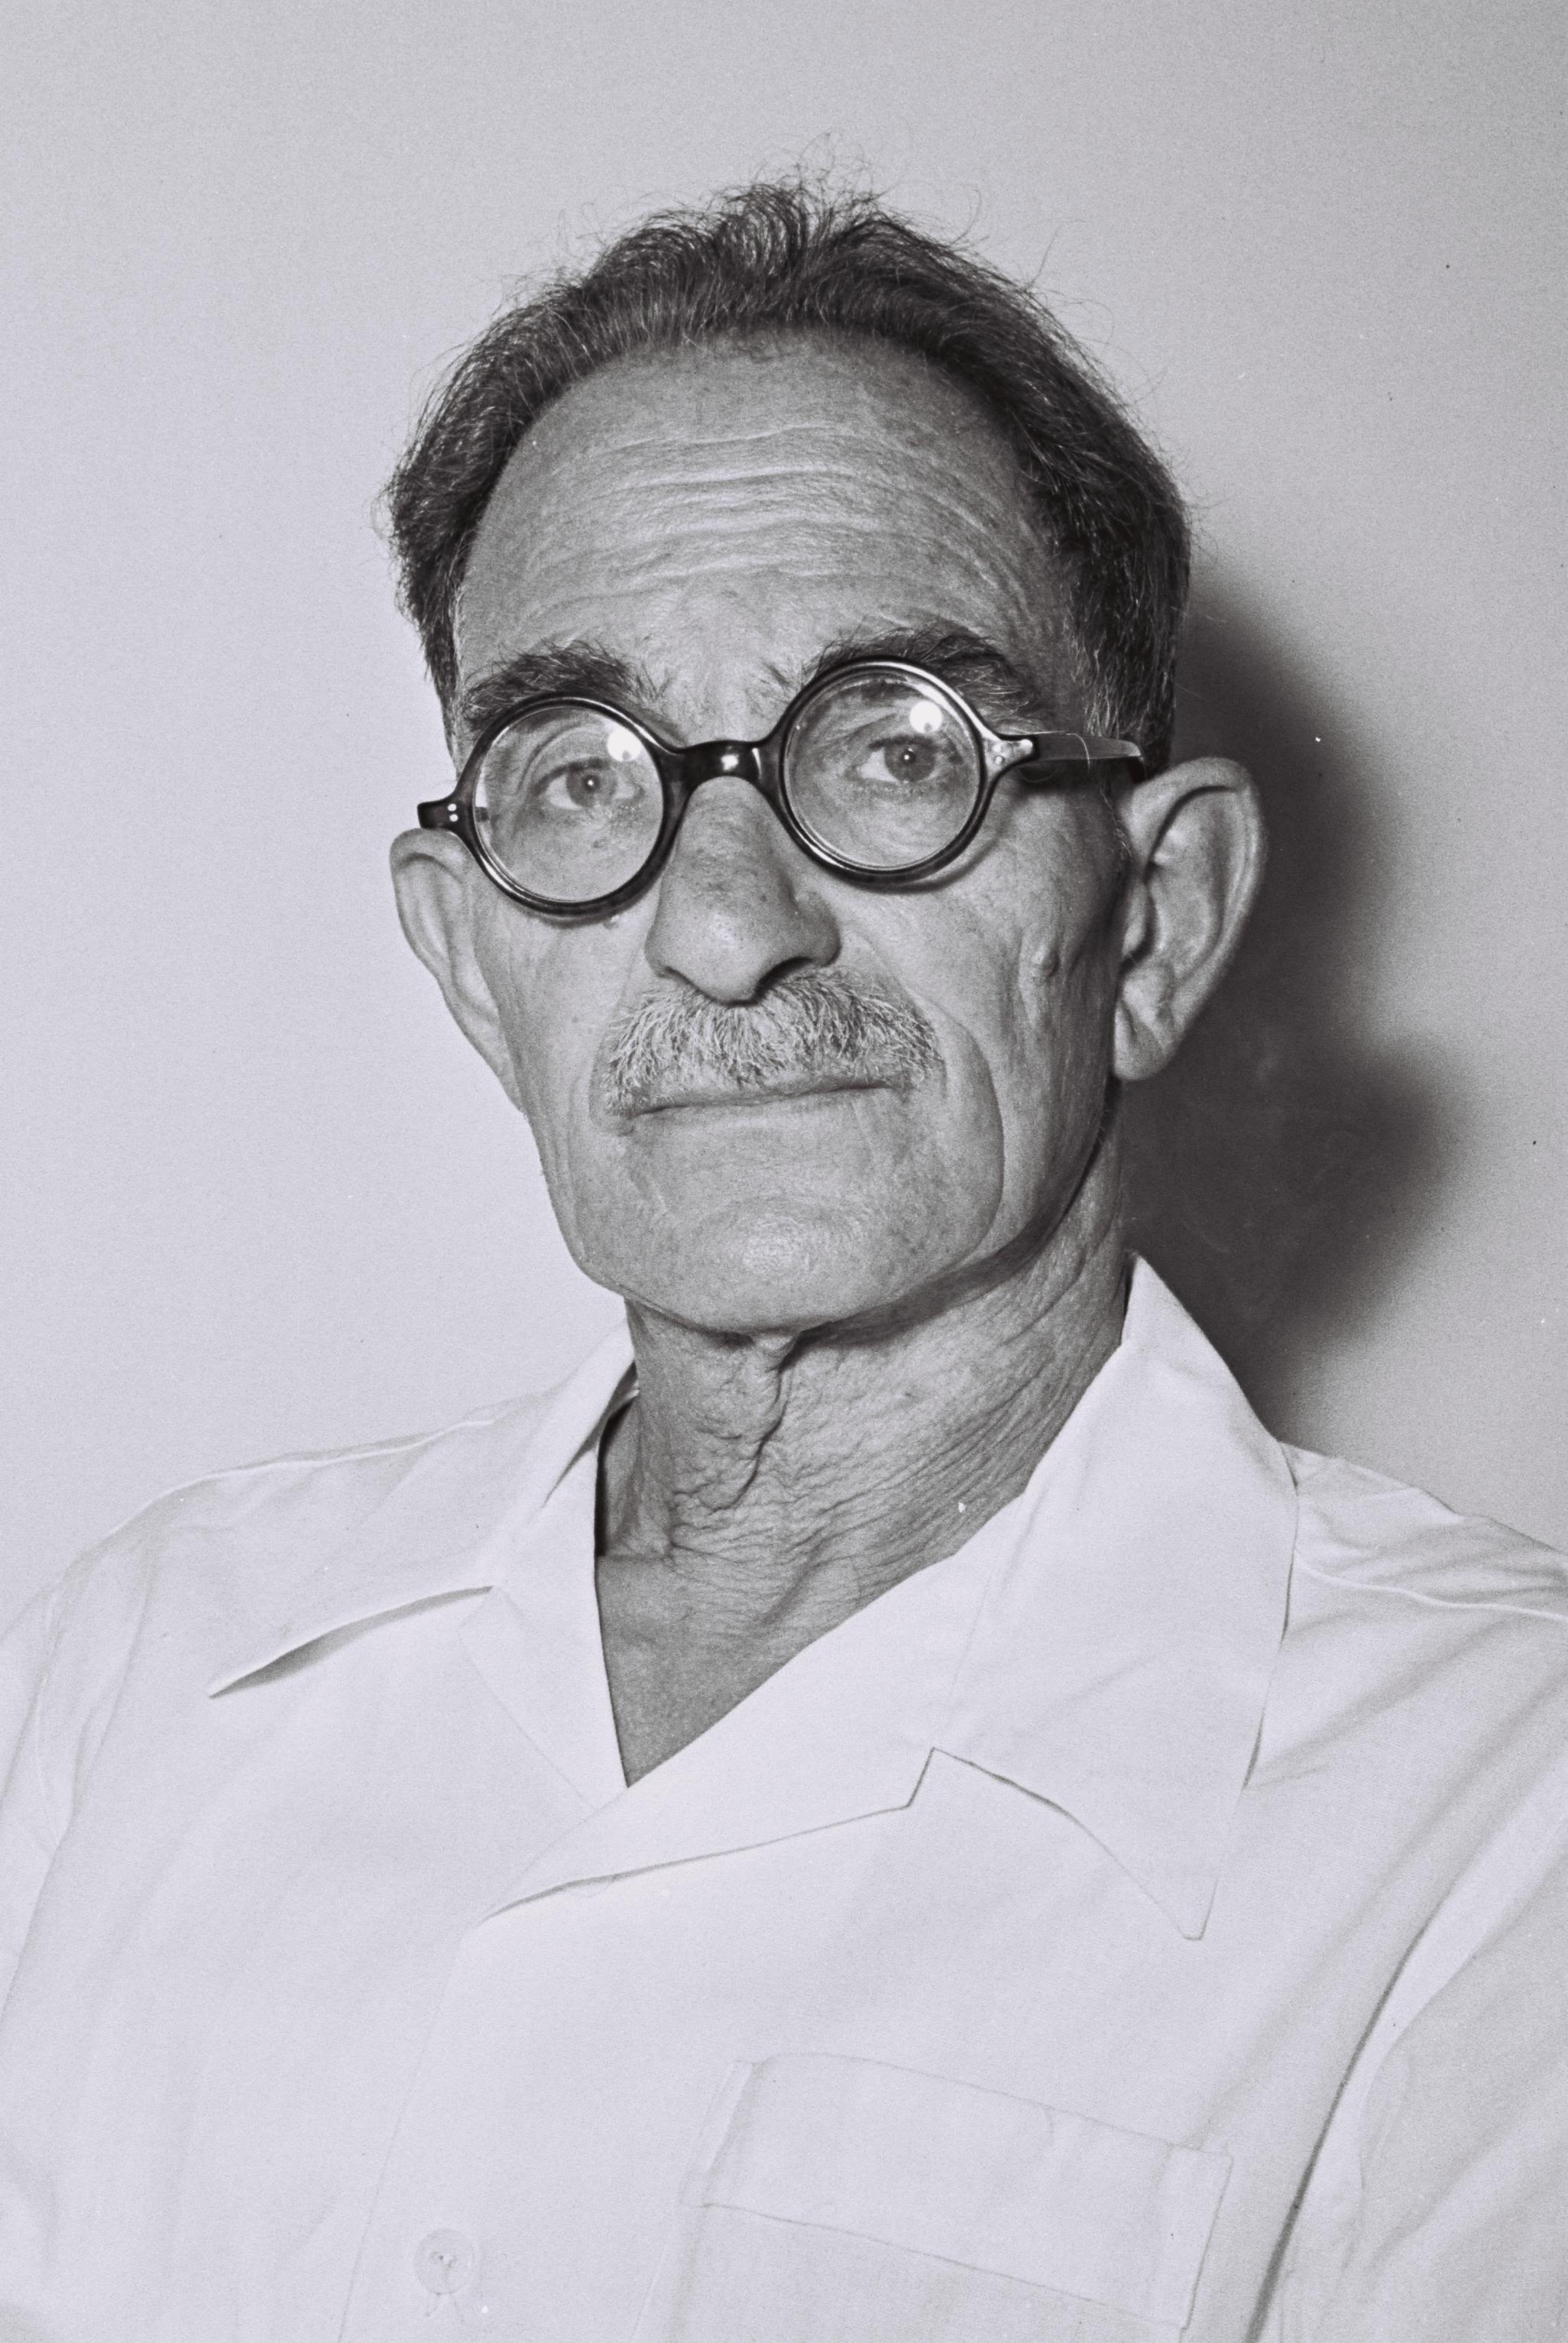 http://upload.wikimedia.org/wikipedia/commons/2/27/Moshe_erem.jpeg